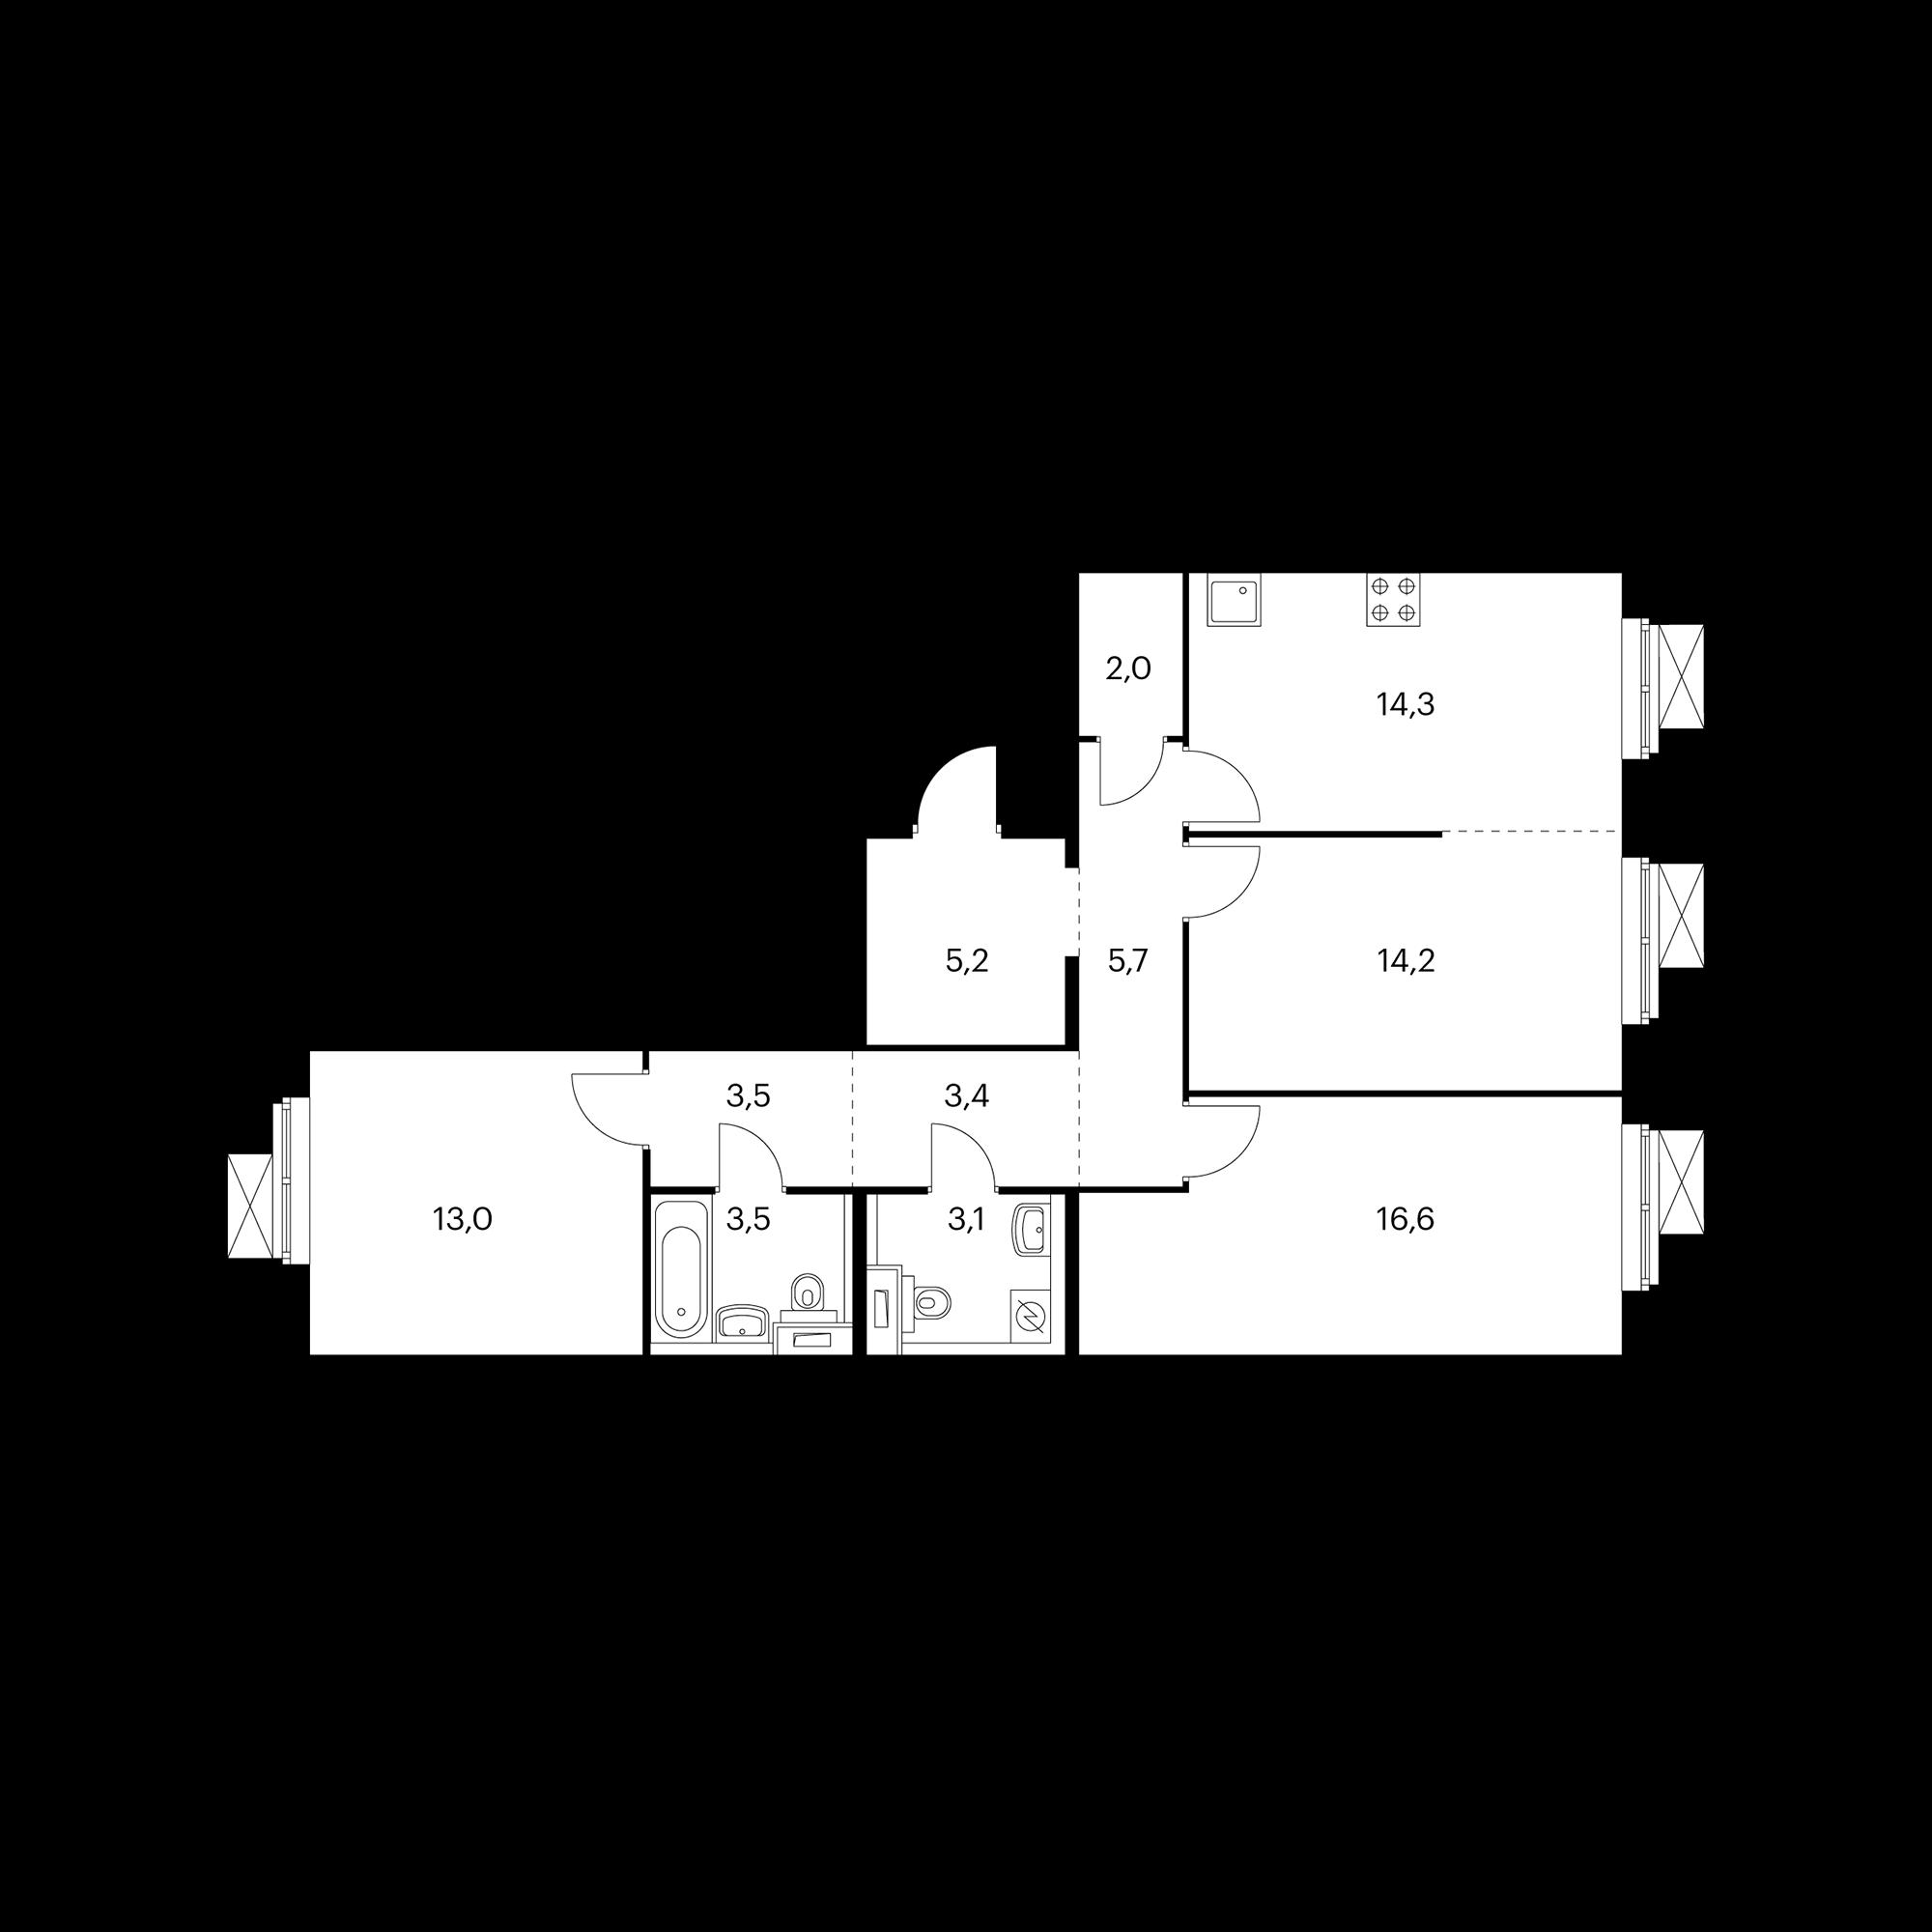 3KL13_9.0-1_S_Z